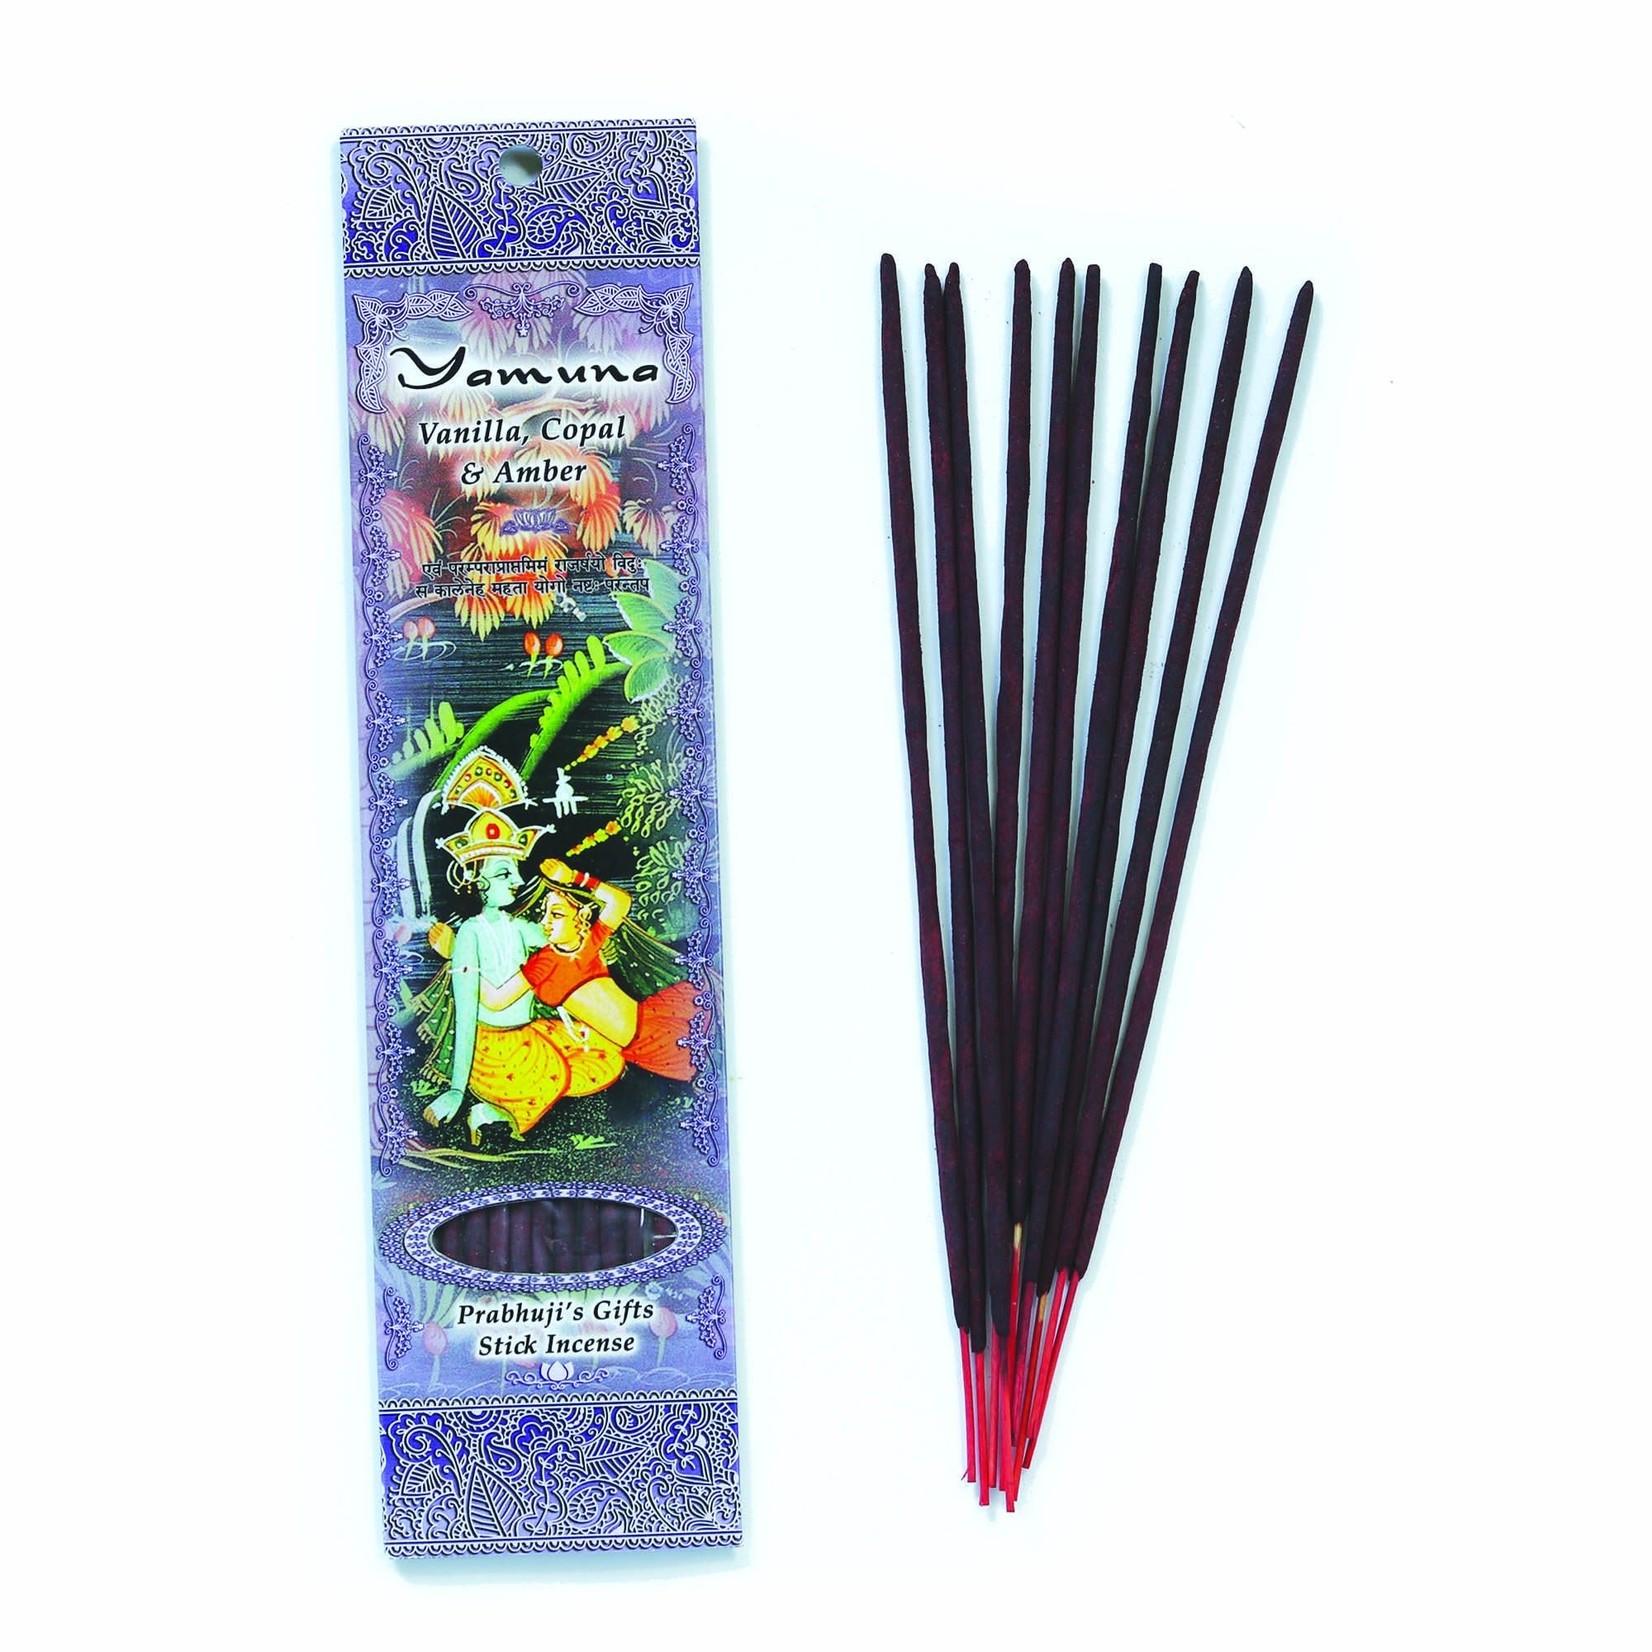 Prabhujis Gifts Yamuna  Vanilla, Copal and Amber Incense sticks